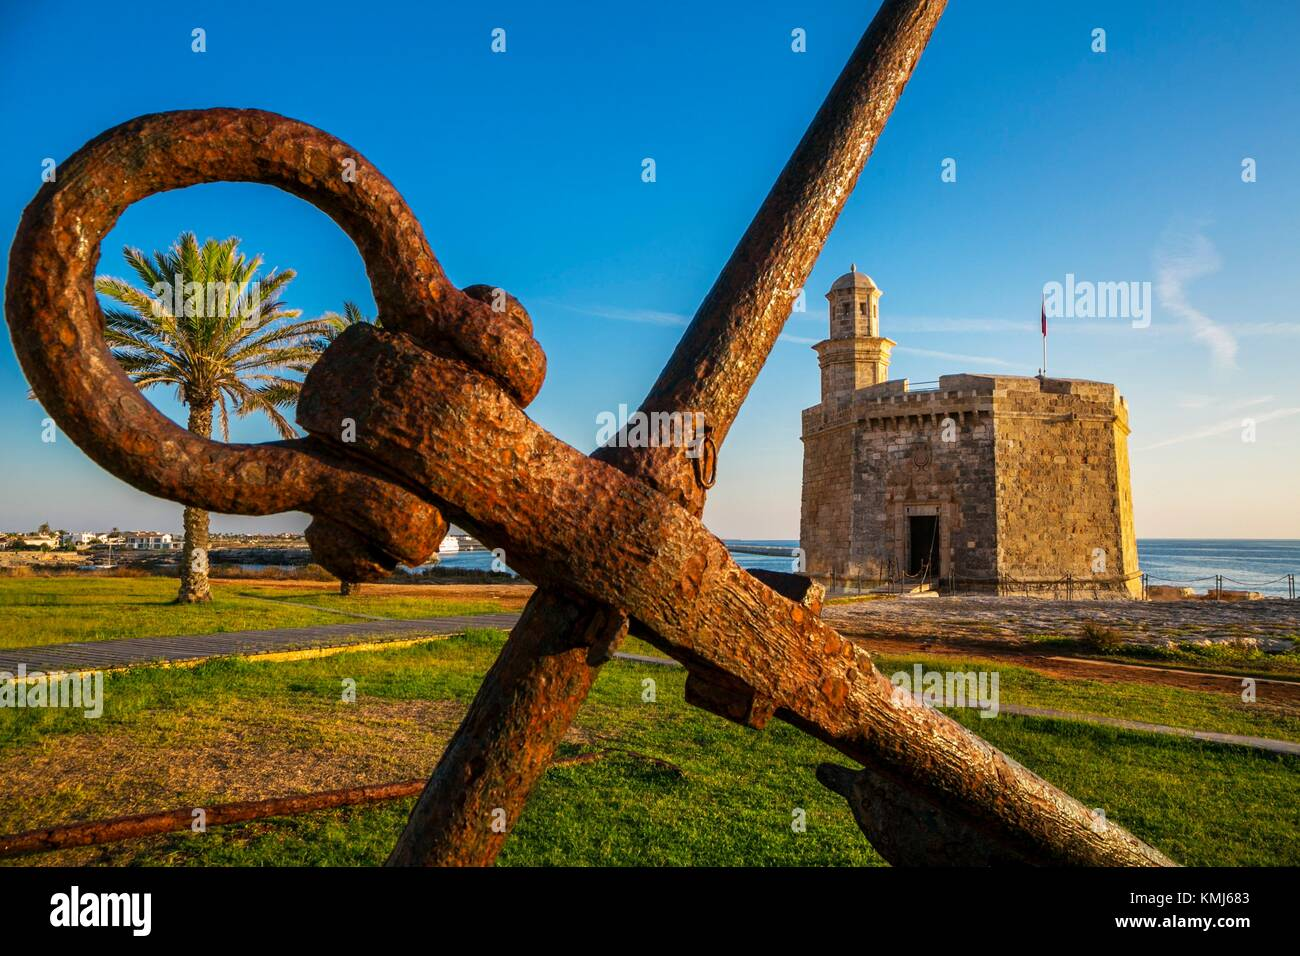 San Nicolas Castle. Ciutadella. Minorca. Balearic Islands. Spain - Stock Image